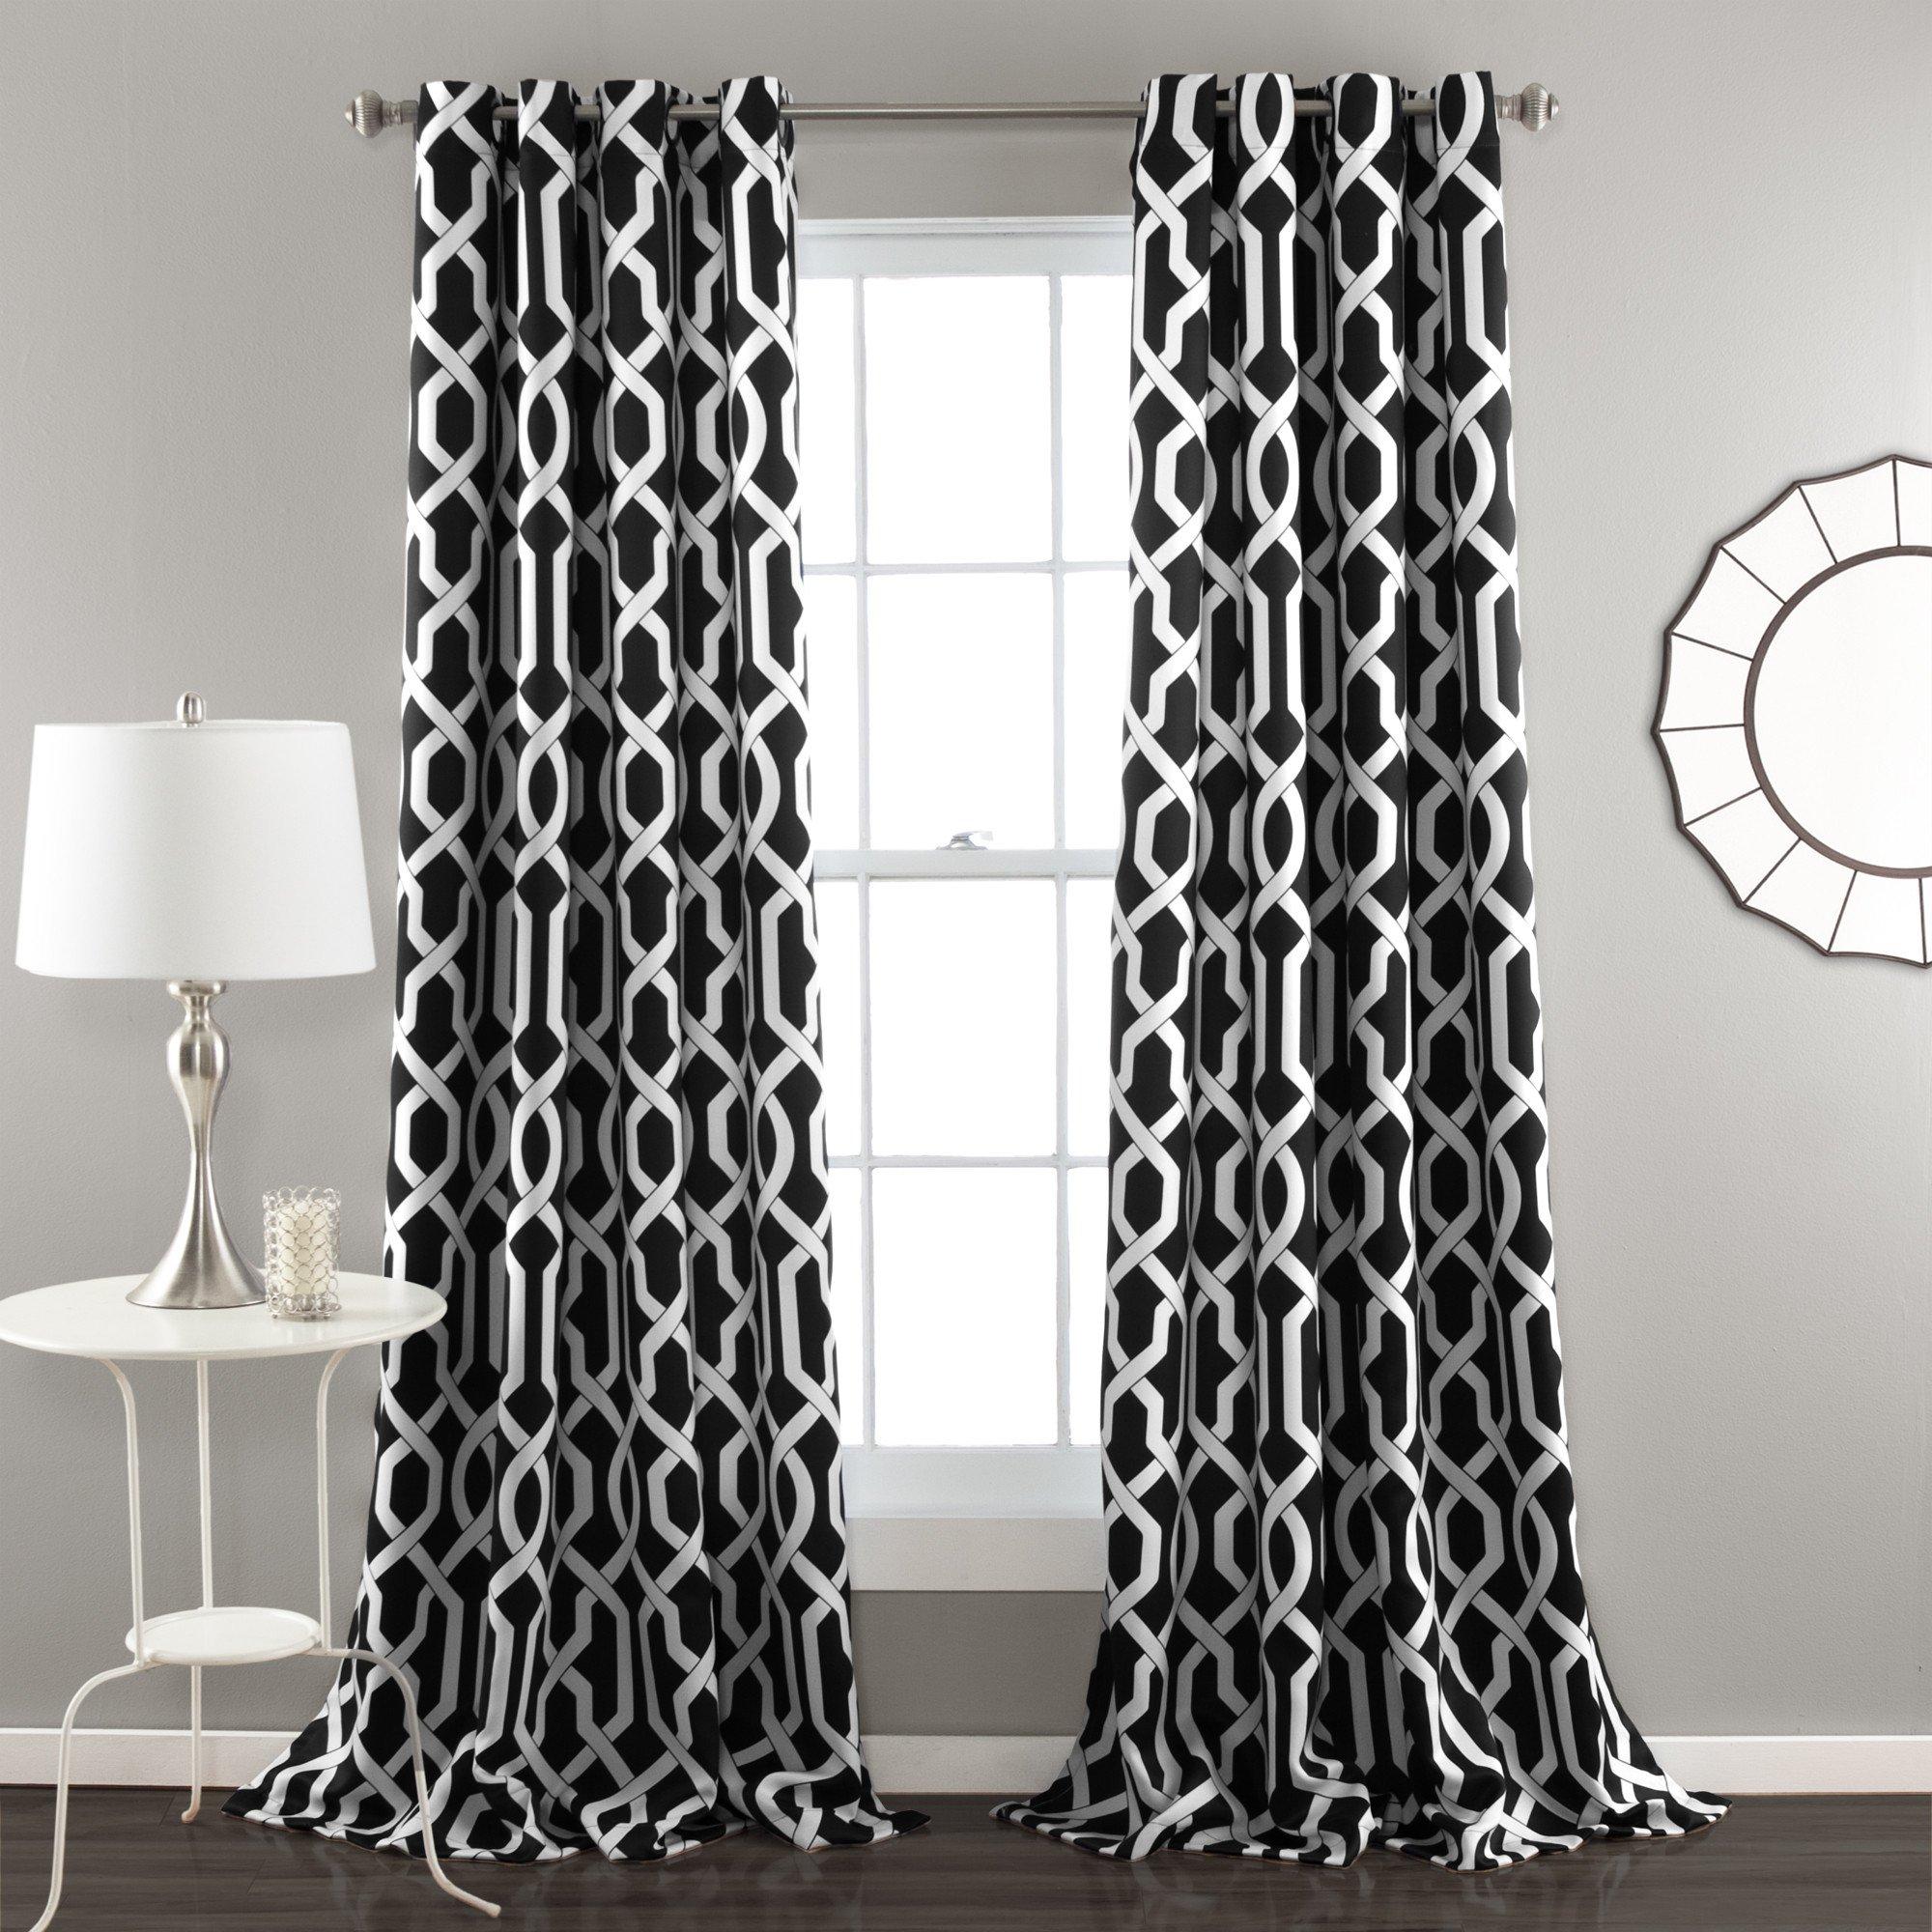 Edward Trellis Room Darkening Window Curtain Panel Set Rideaux Noirs Decoration Deco Rideau